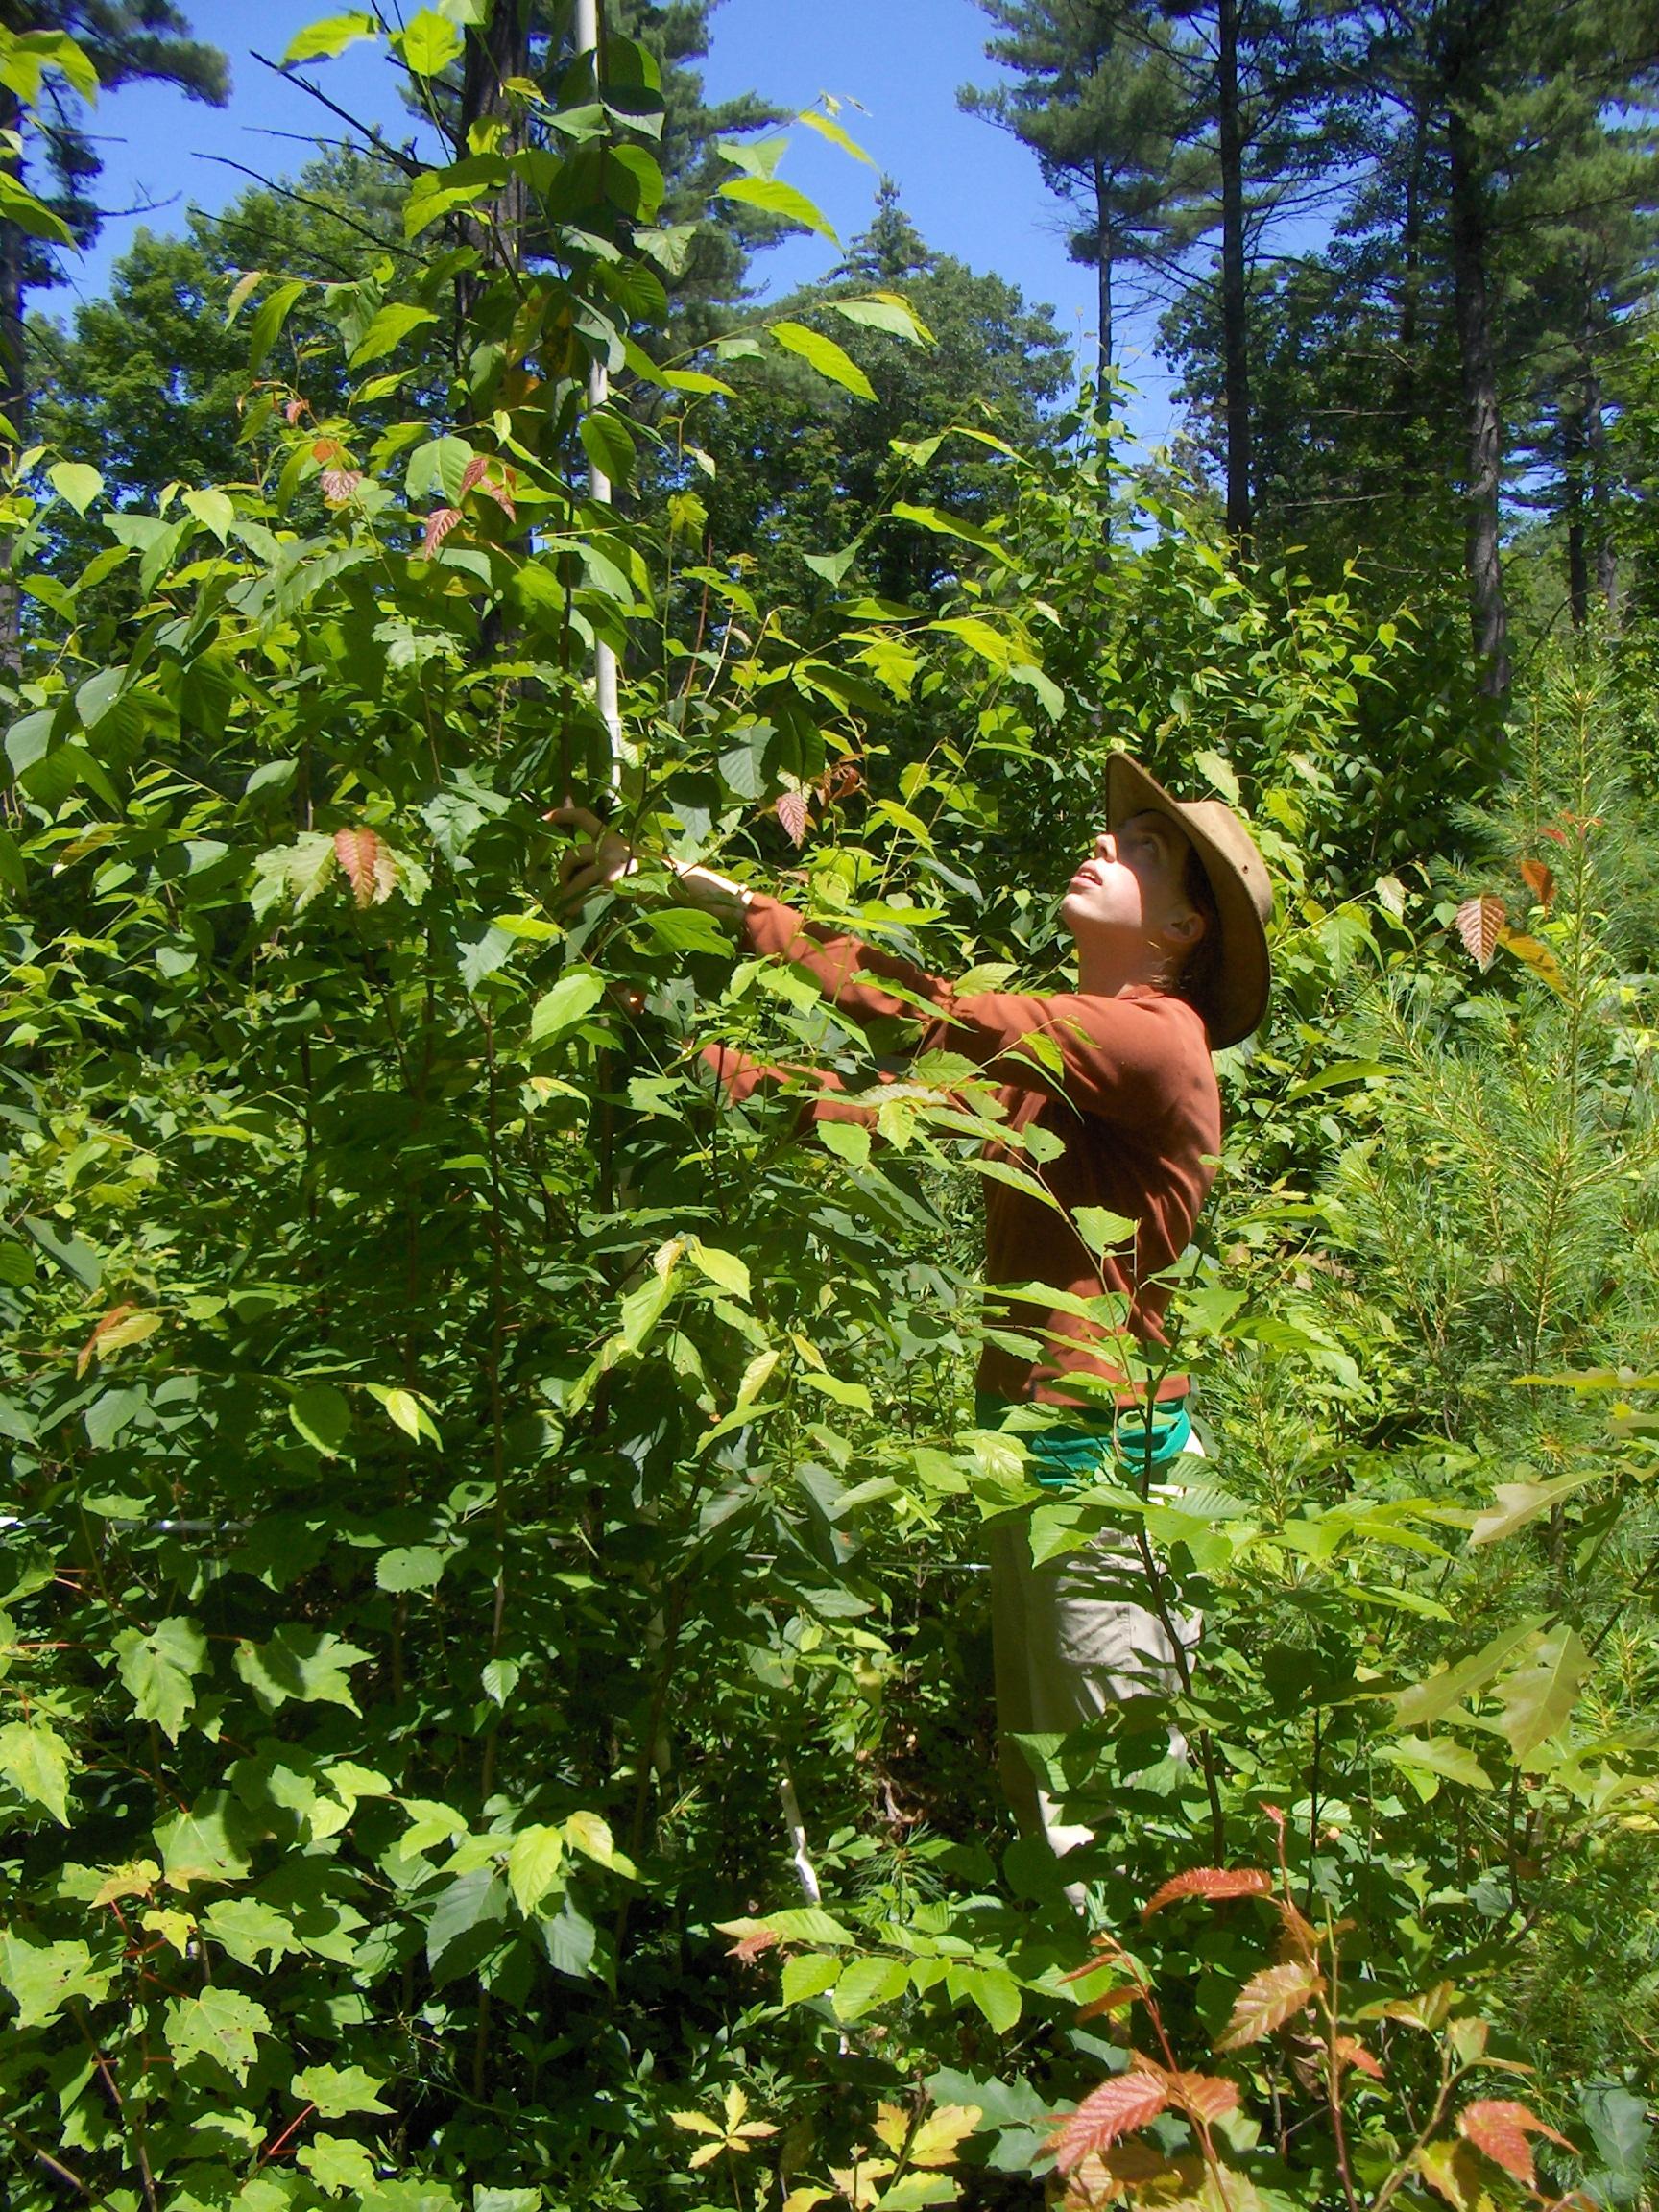 Harvard Forest: Summer Research Program Student Measures Hardwood Regrowth